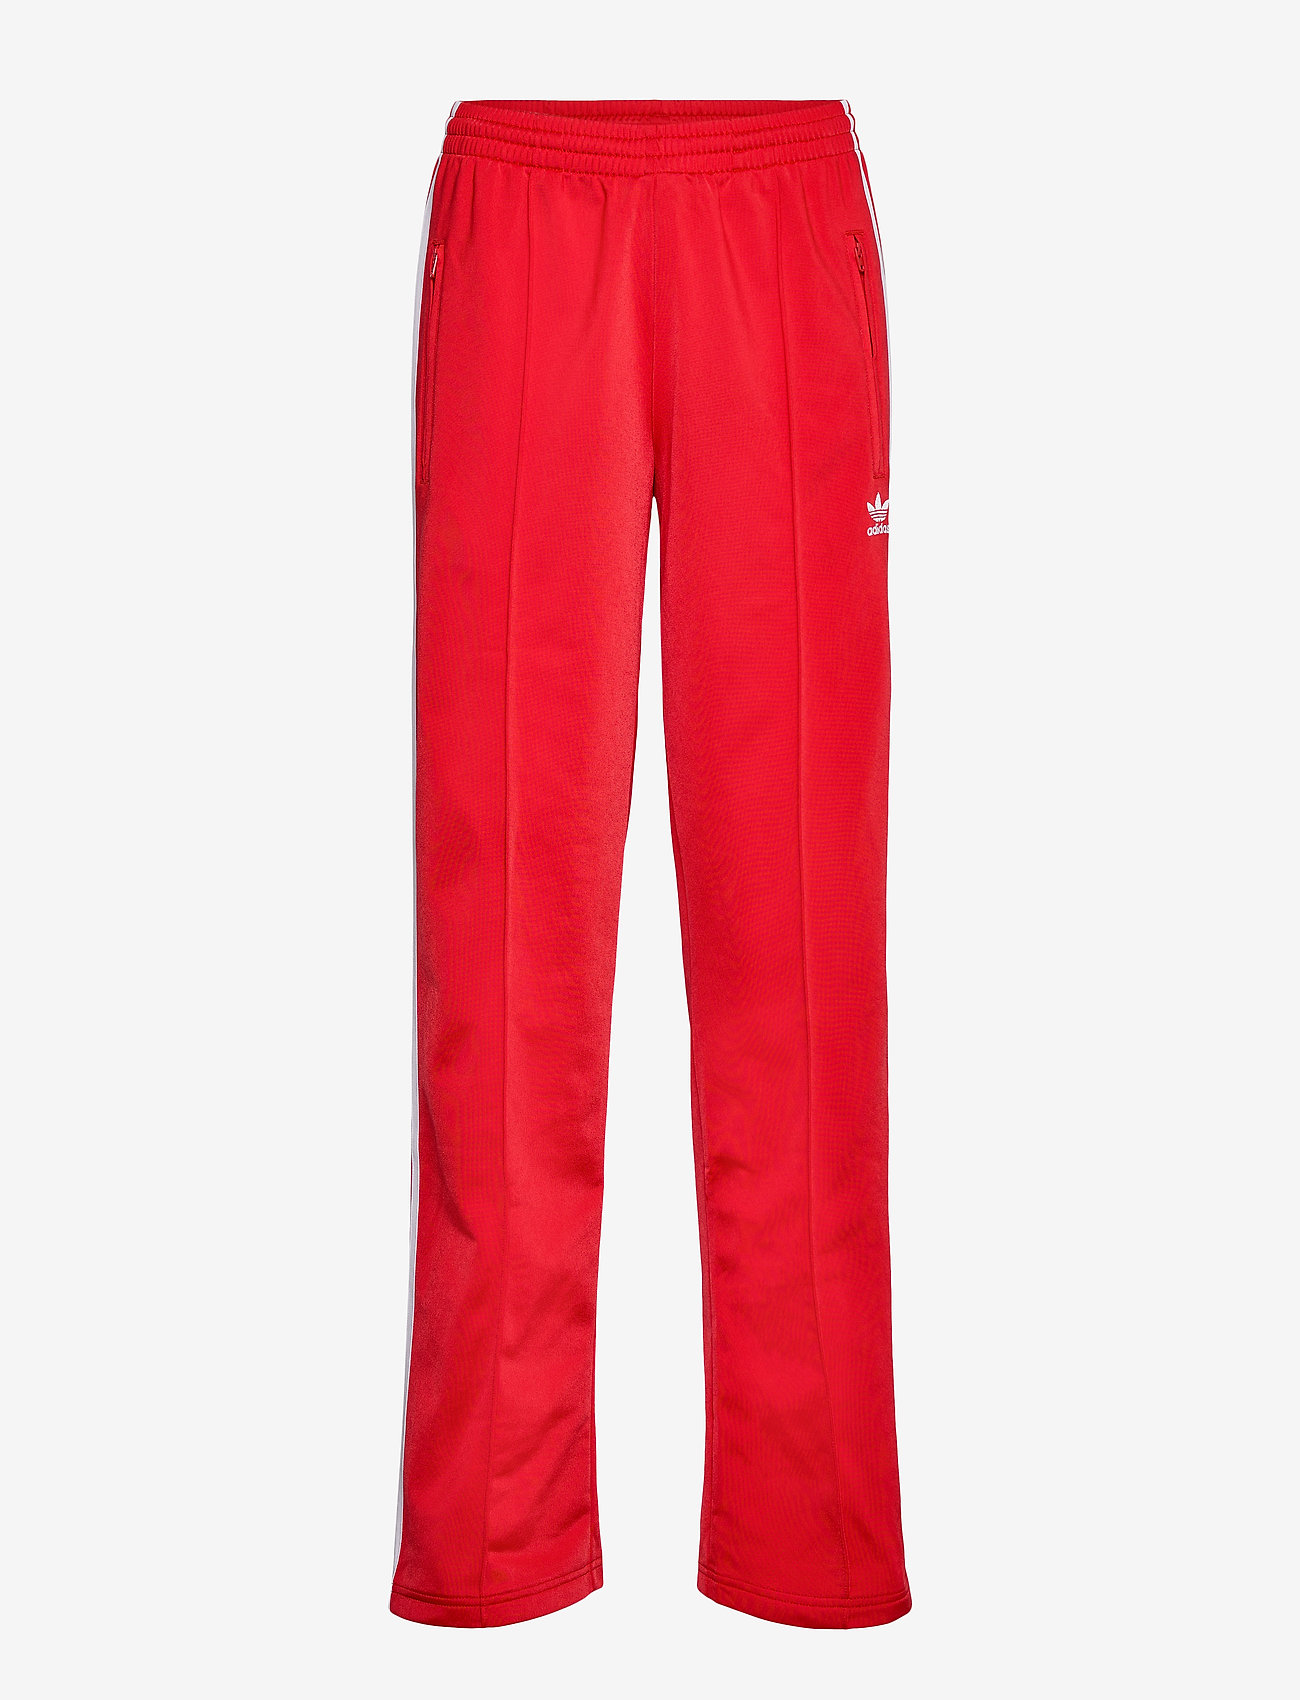 adidas Originals - Adicolor Classics Firebird Primeblue Track Pants W - trainingsbroek - scarle - 1